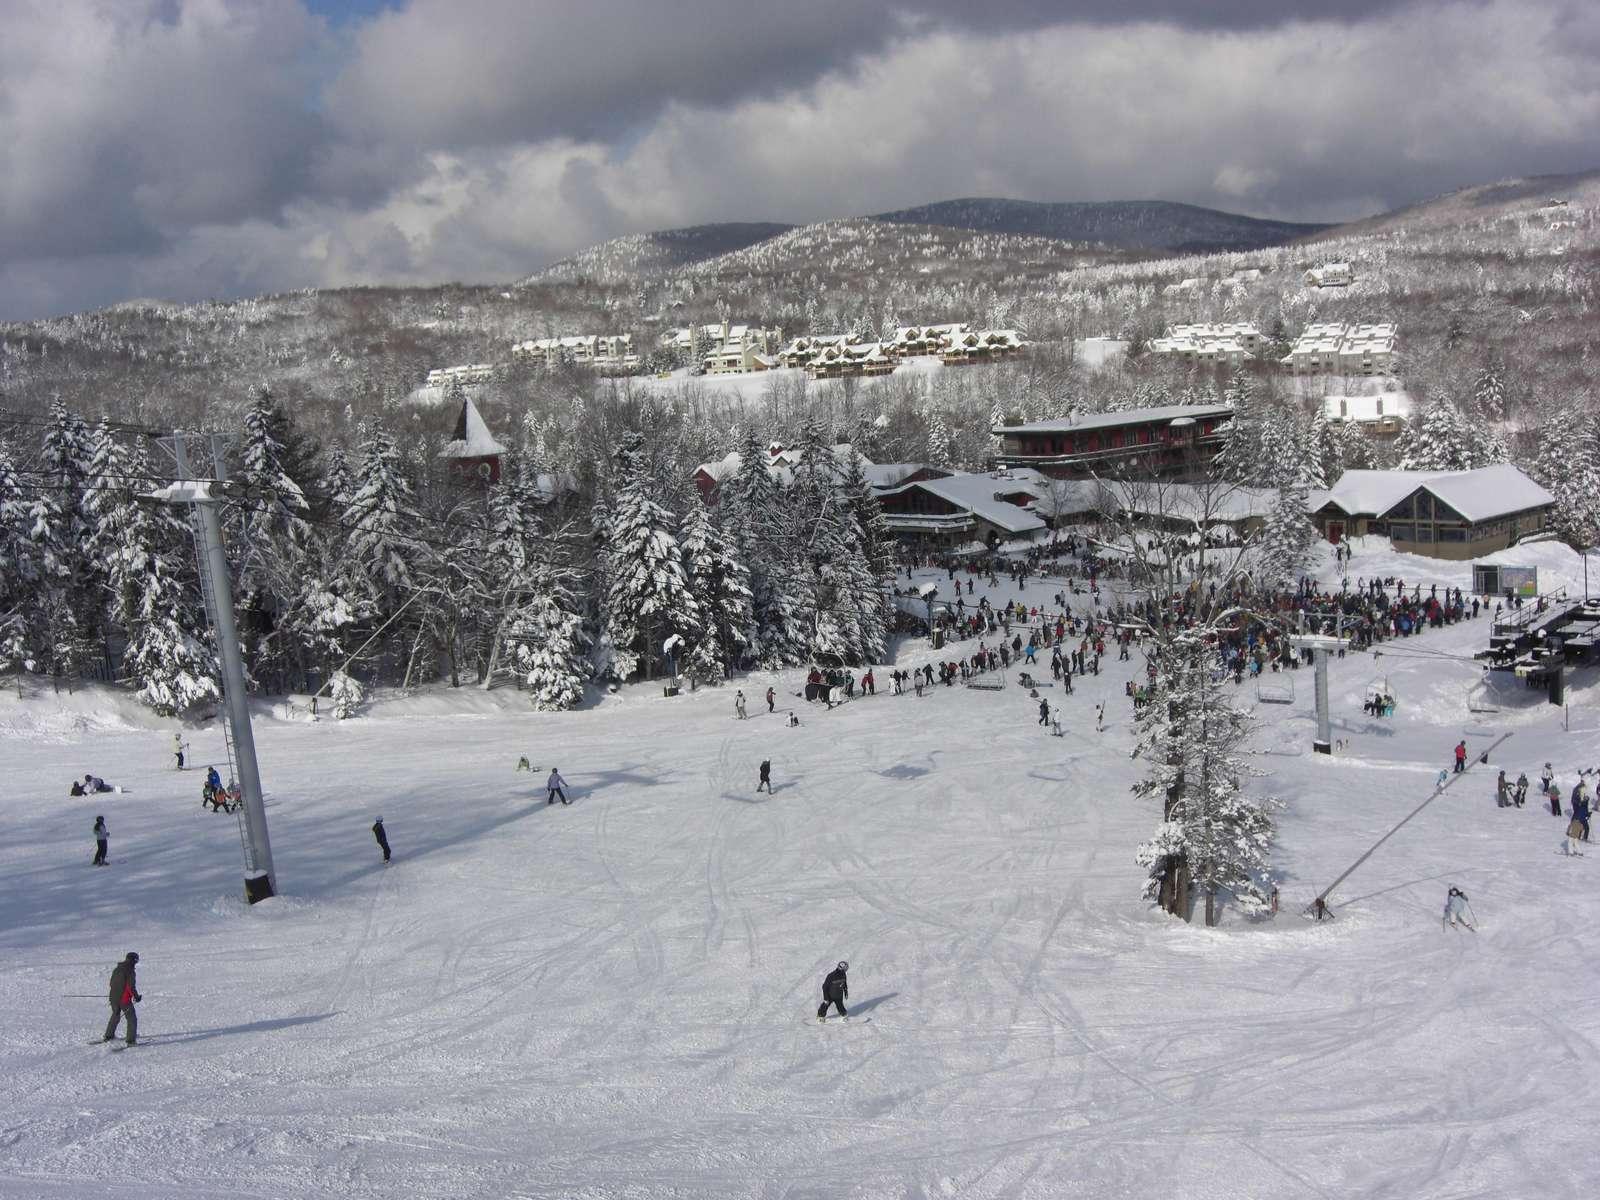 On Mount Snow.  Snow Mountain Village seen from slopes.